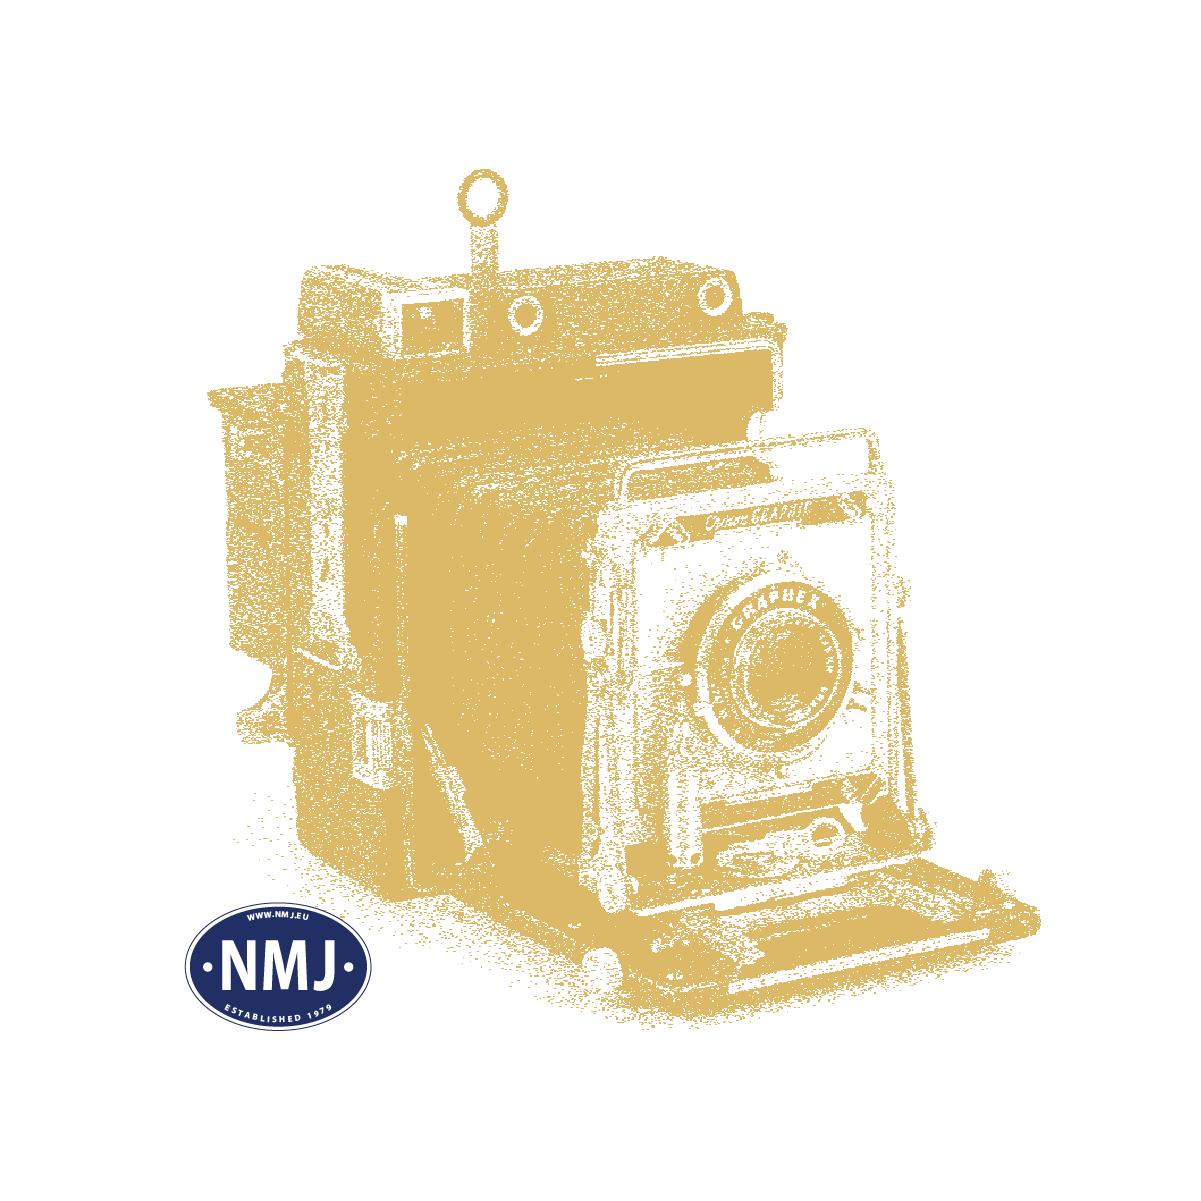 NMJT90205 - NMJ Topline 91205 MAV M61.019, Nohab, DCC Sound, H0